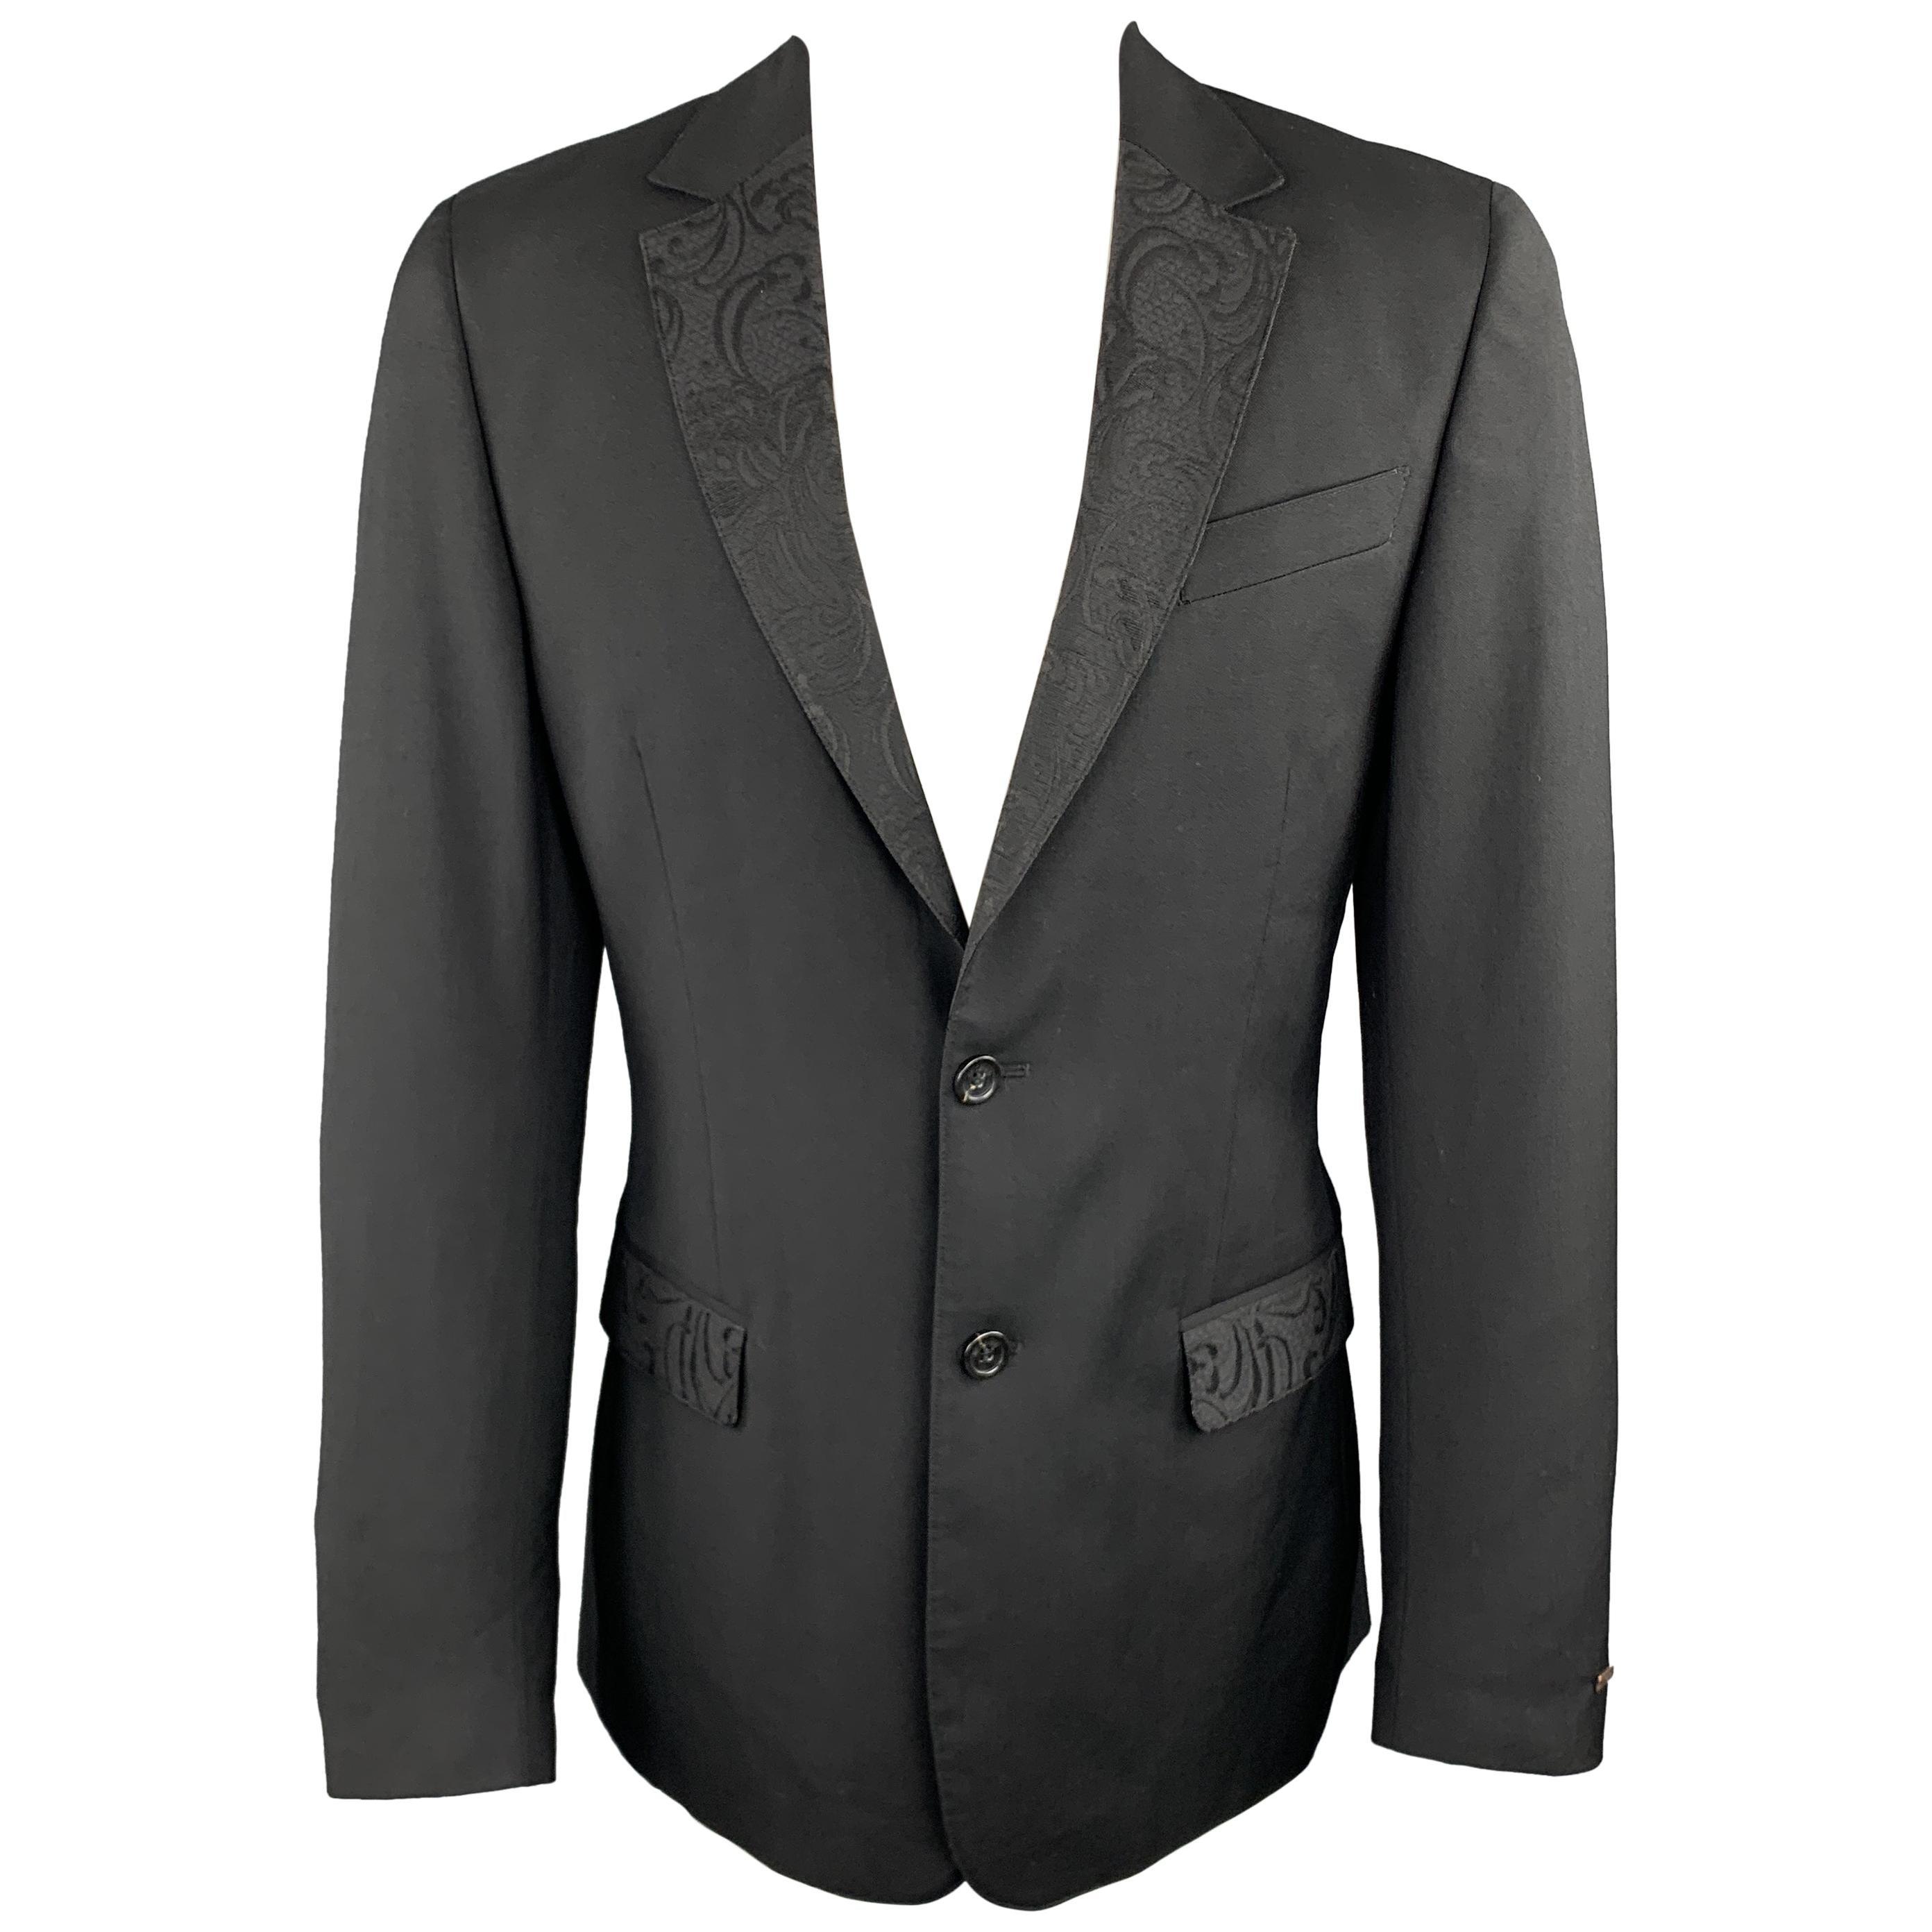 JUST CAVALLI Size 40 Black Wool Lace Notch Lapel Sport Coat